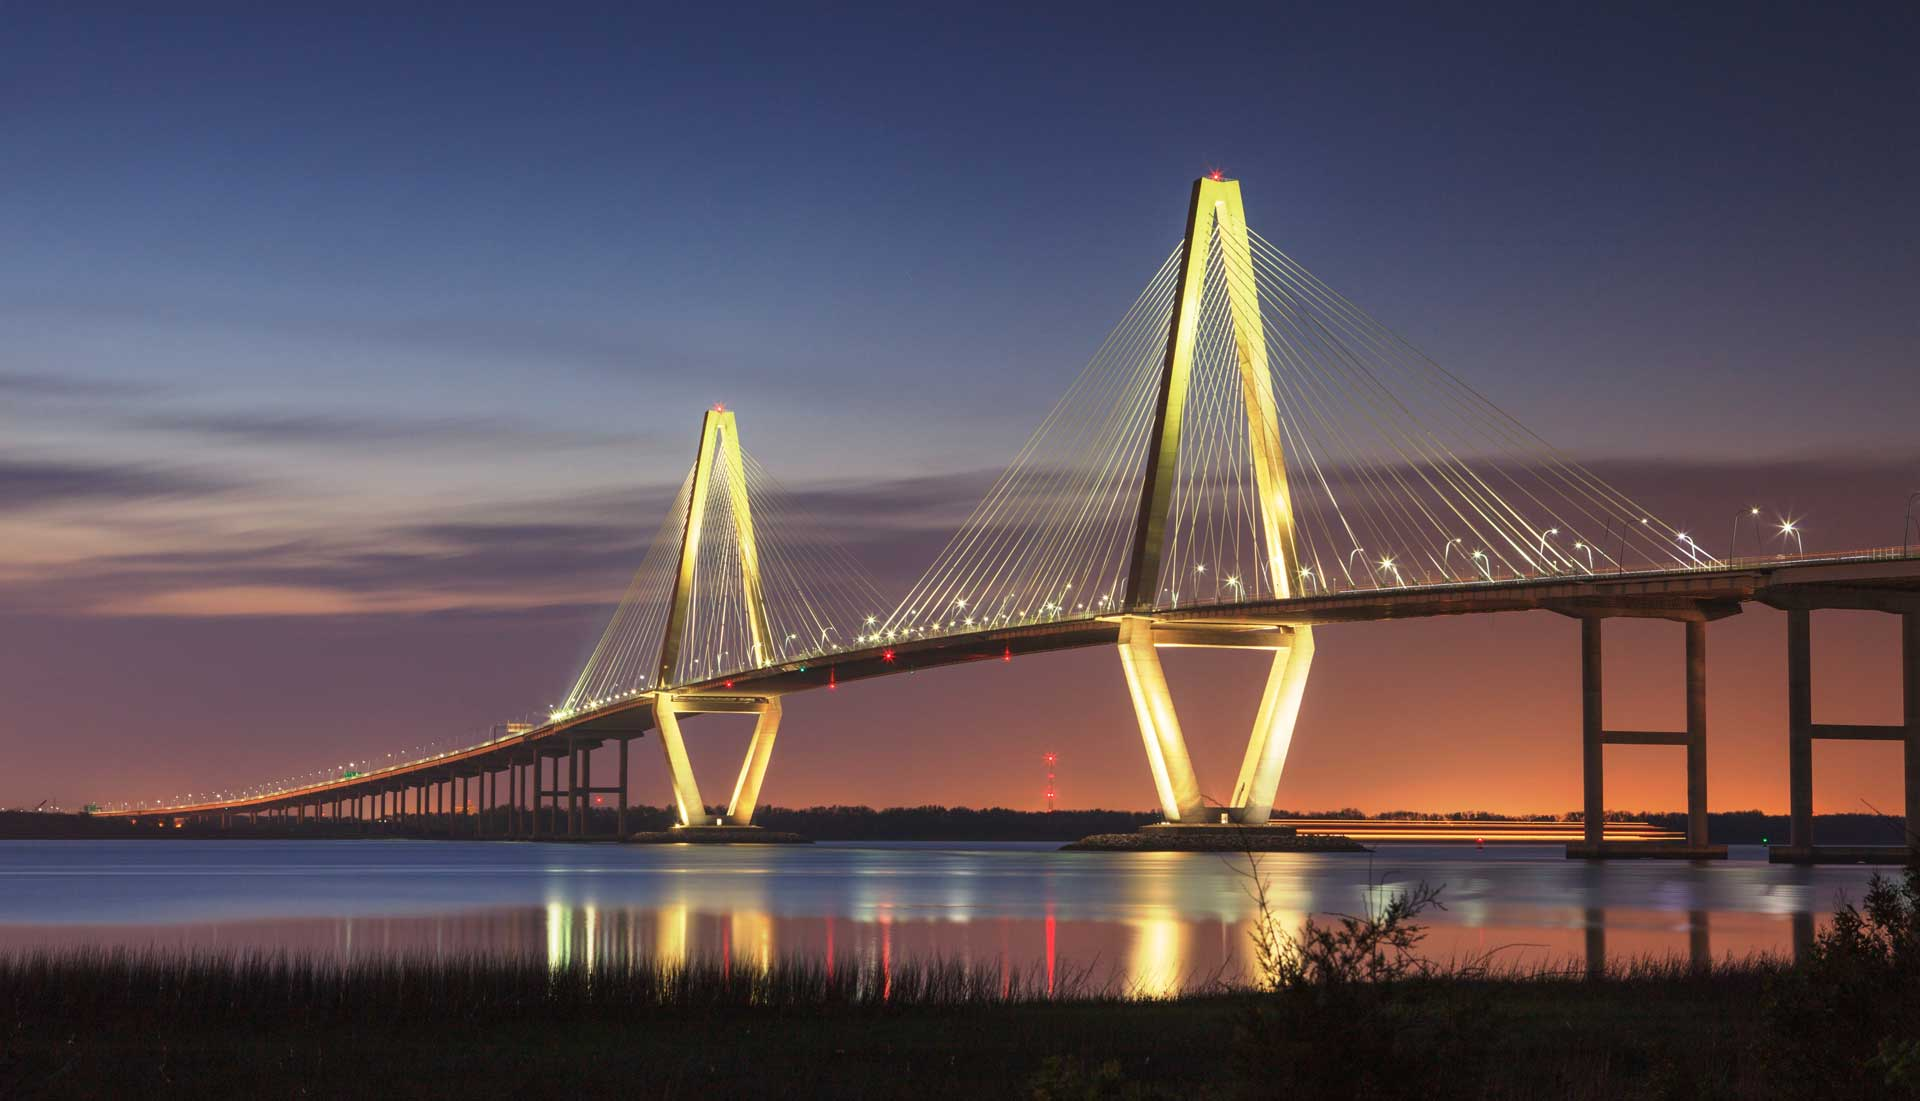 Bridge HD wallpapers, Desktop wallpaper - most viewed